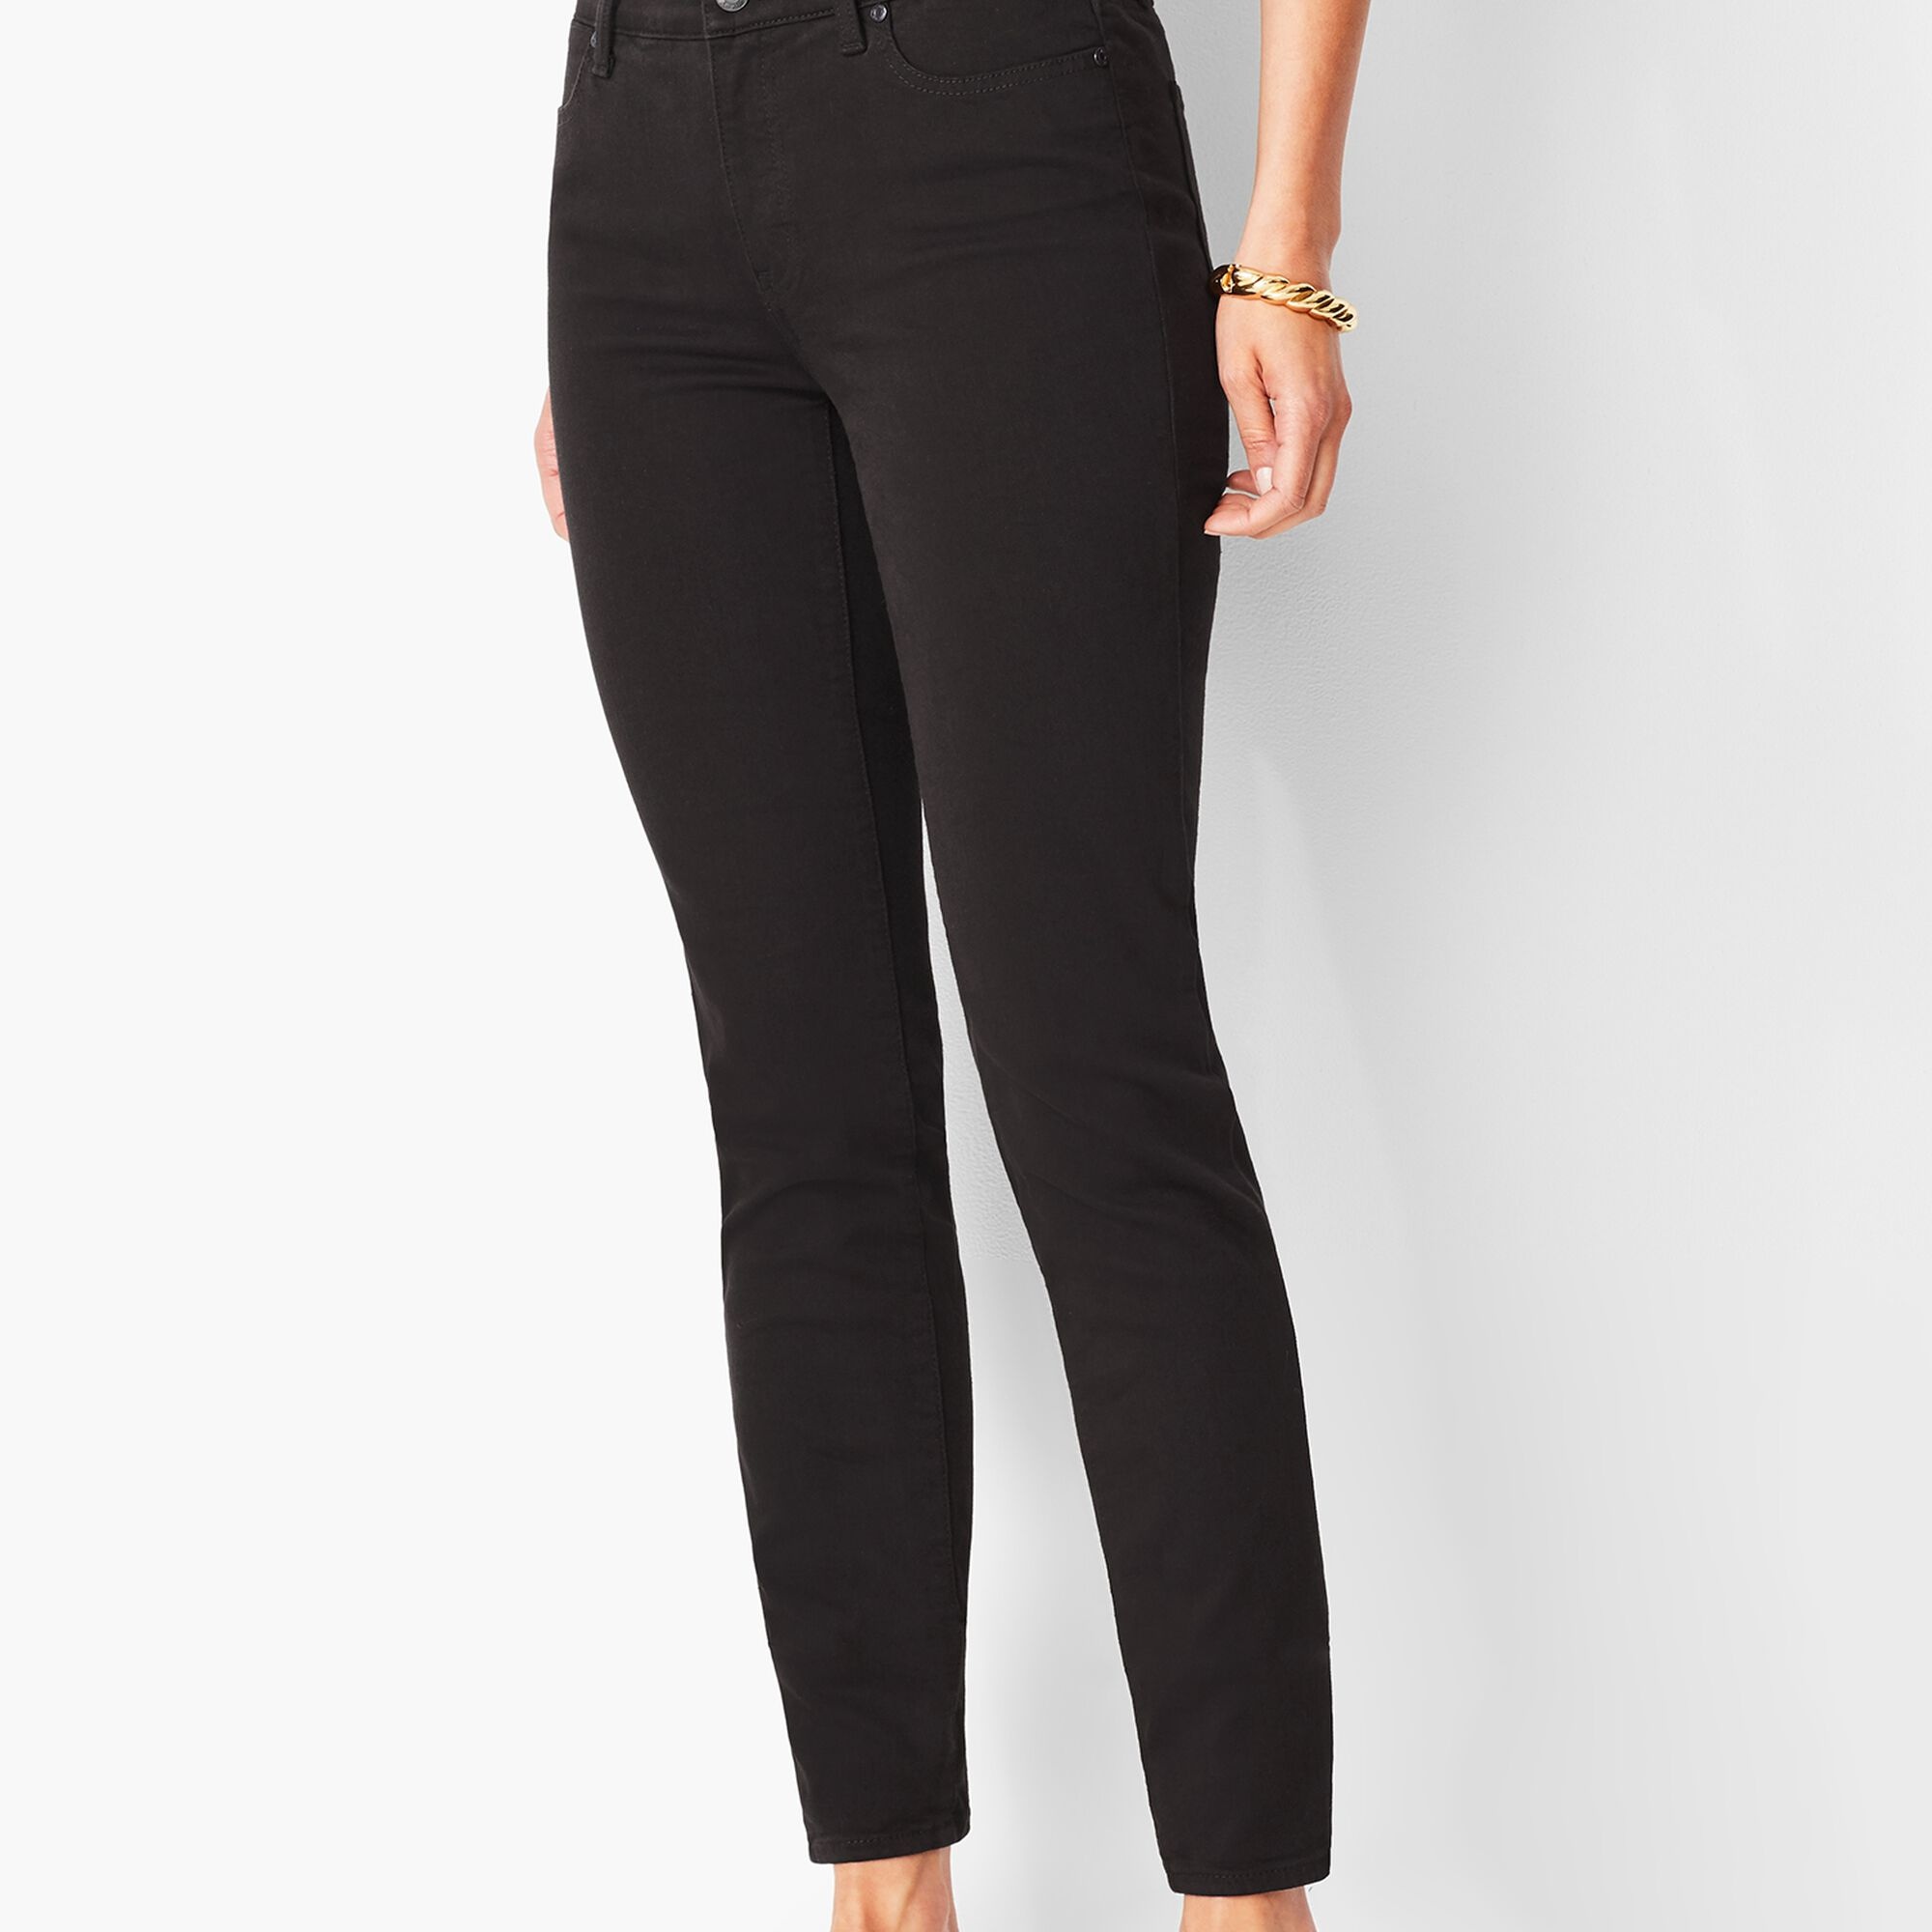 817c8d2082ce Slim Ankle Jeans - Never Fade Black | Talbots